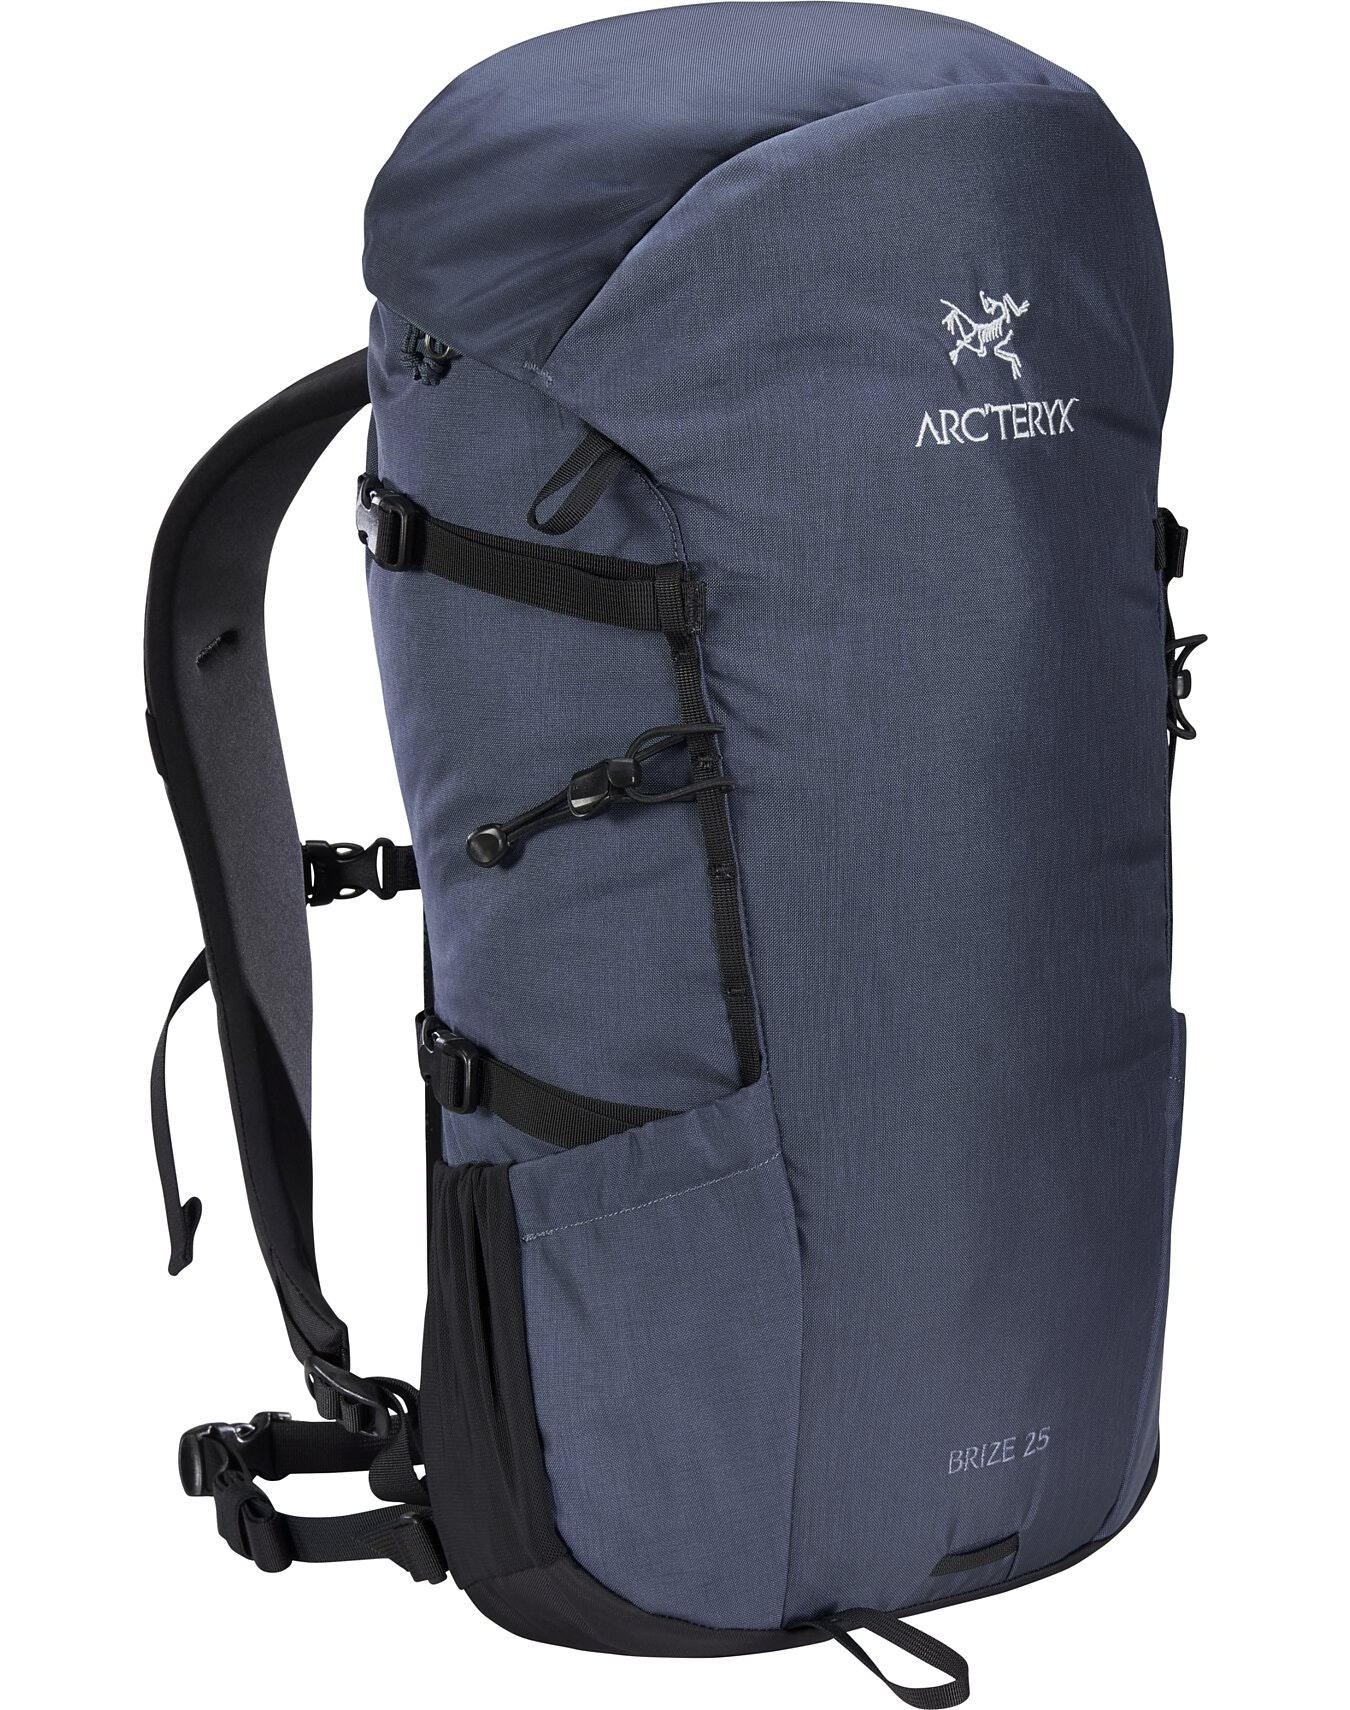 Brize 25 Backpack Dark Mirai